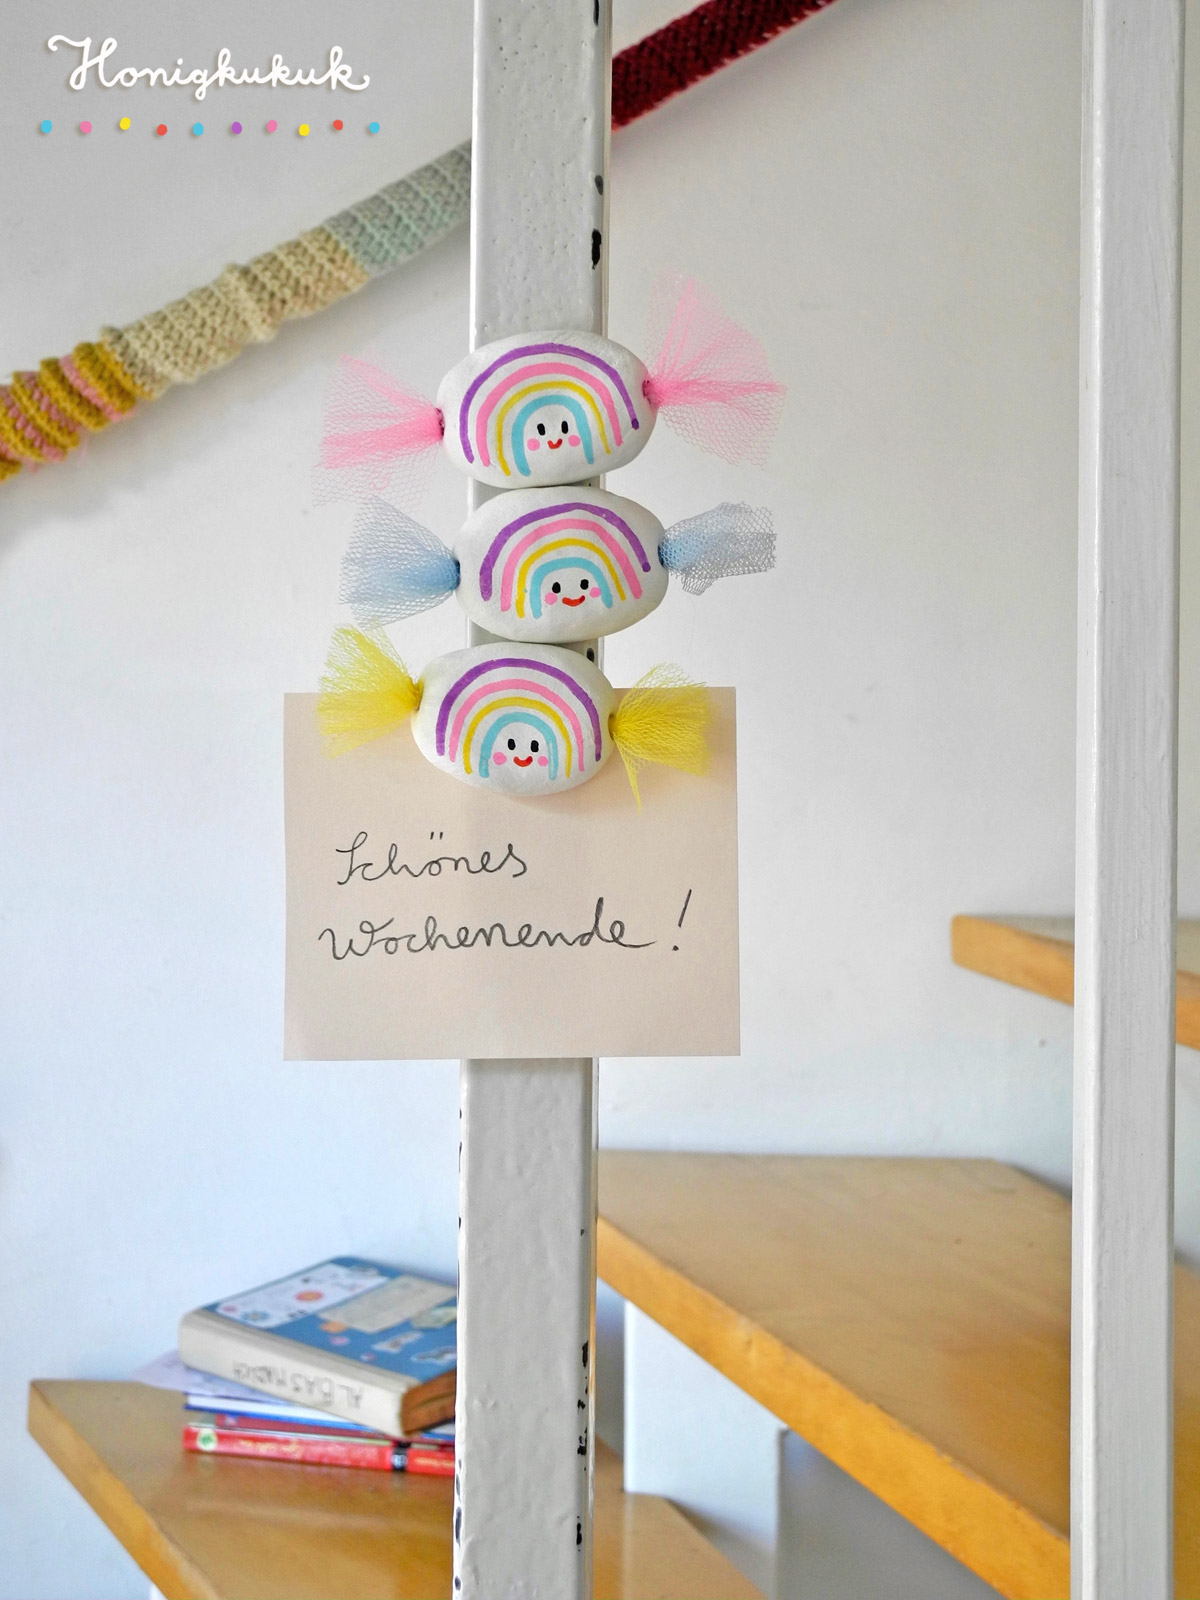 Regenbogen-Bonbons aus Modelliermasse als Magneten